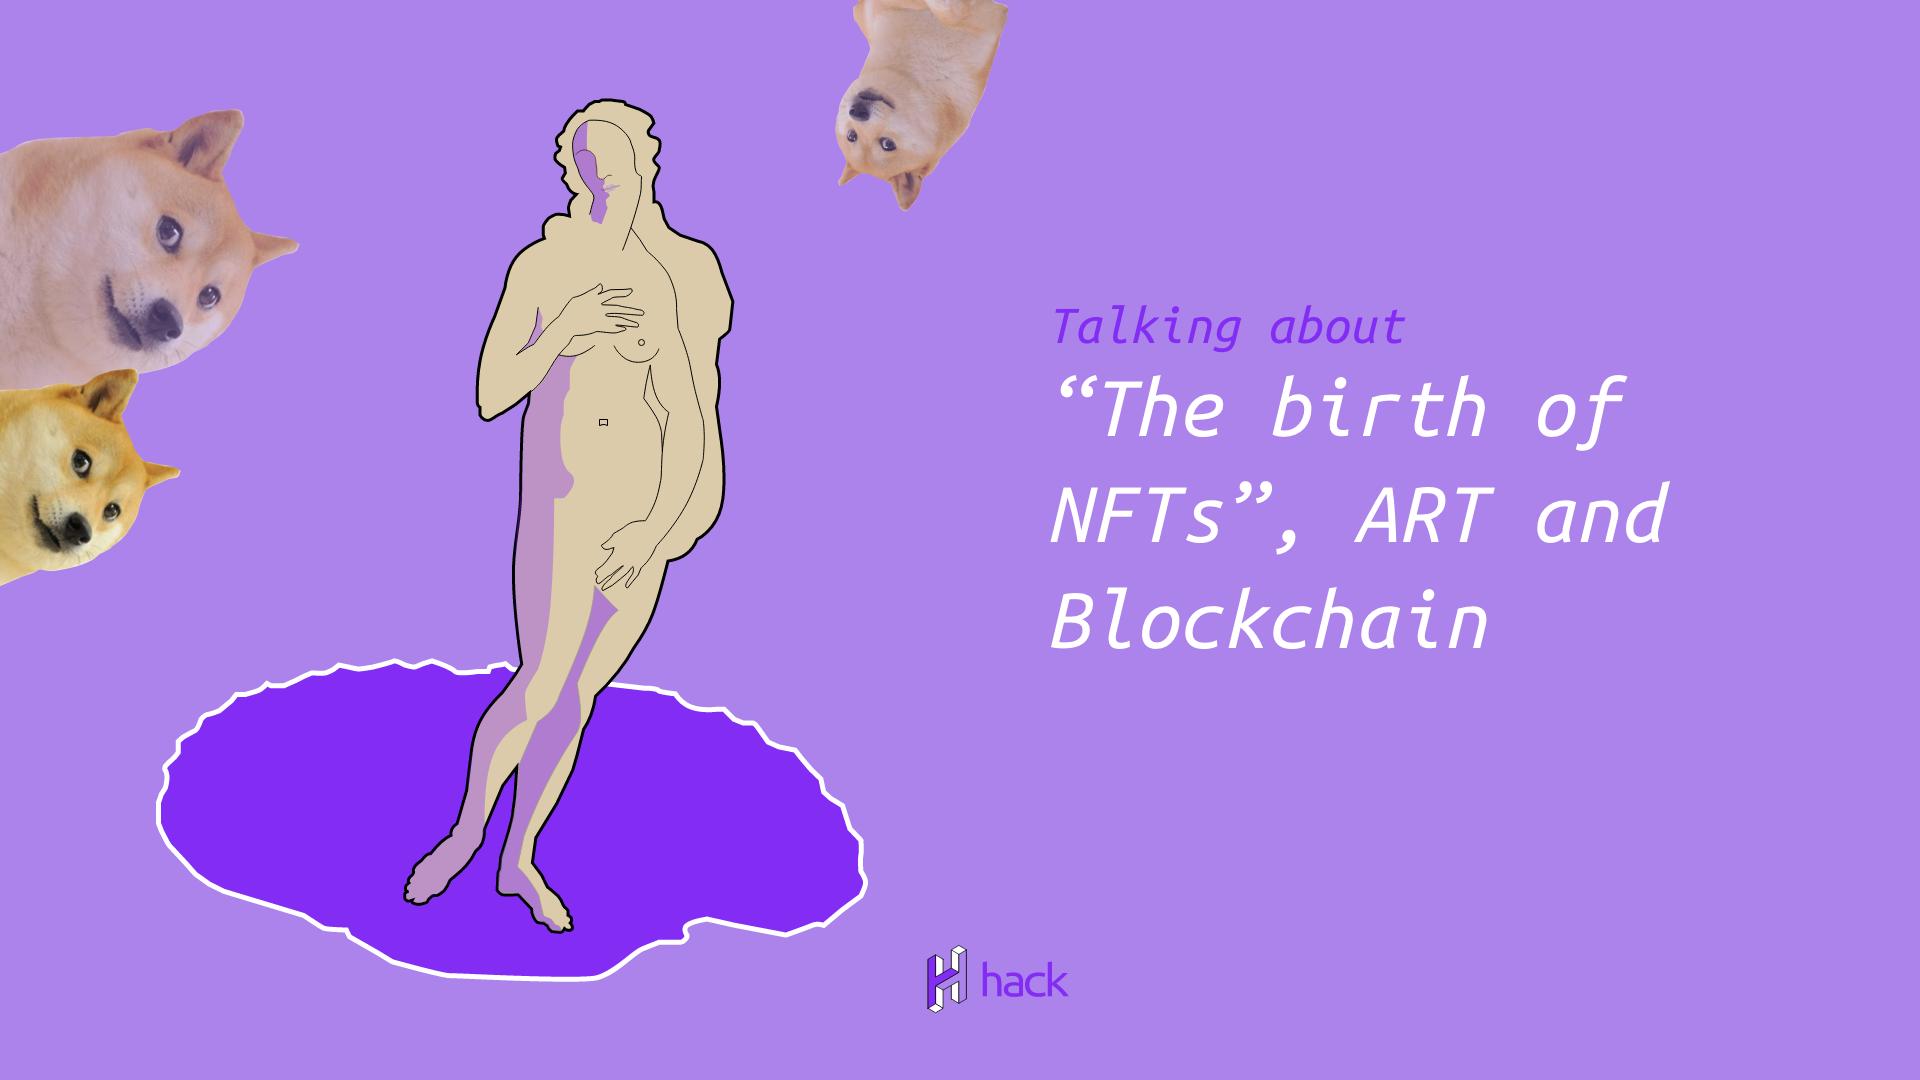 hackCast - NFTs, Art & Blockchain 1